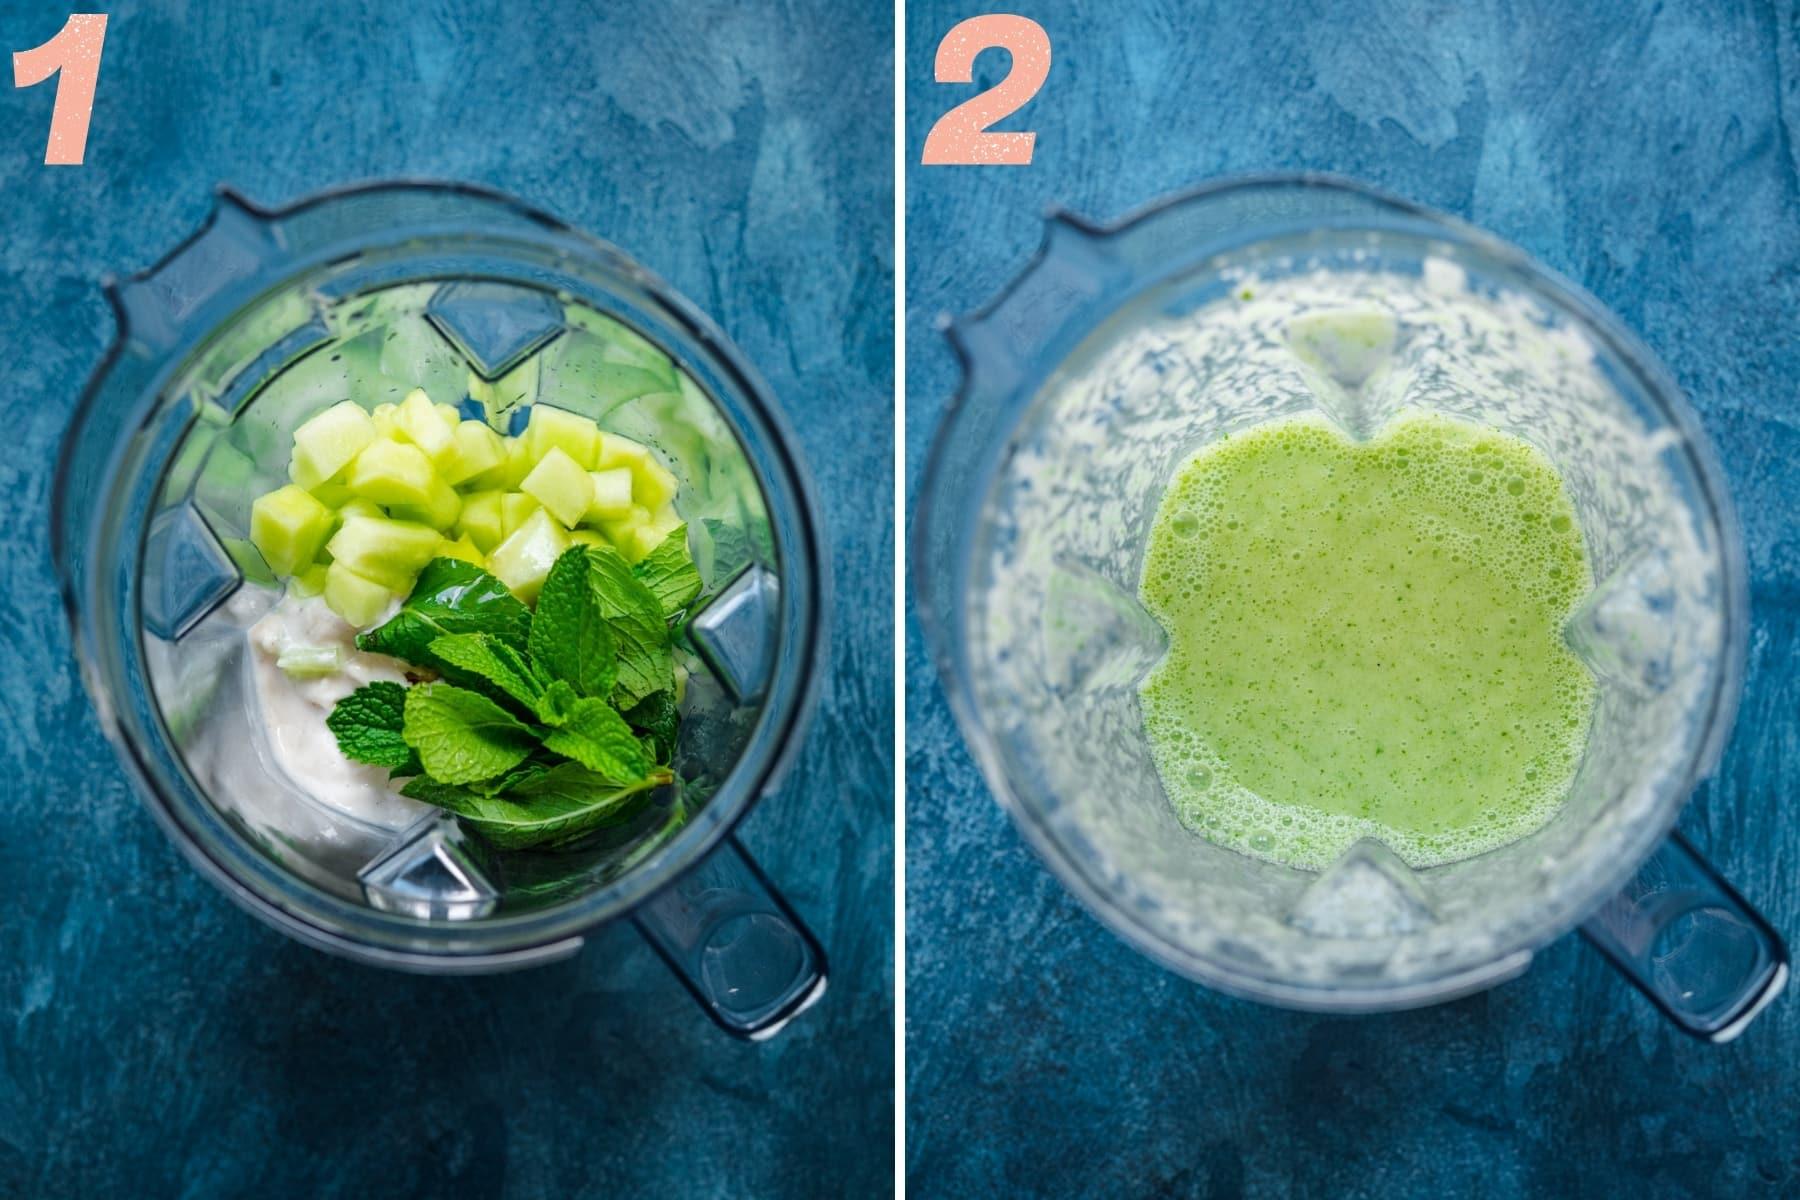 before and after blending ingredients for melon yogurt popsicles in blender.